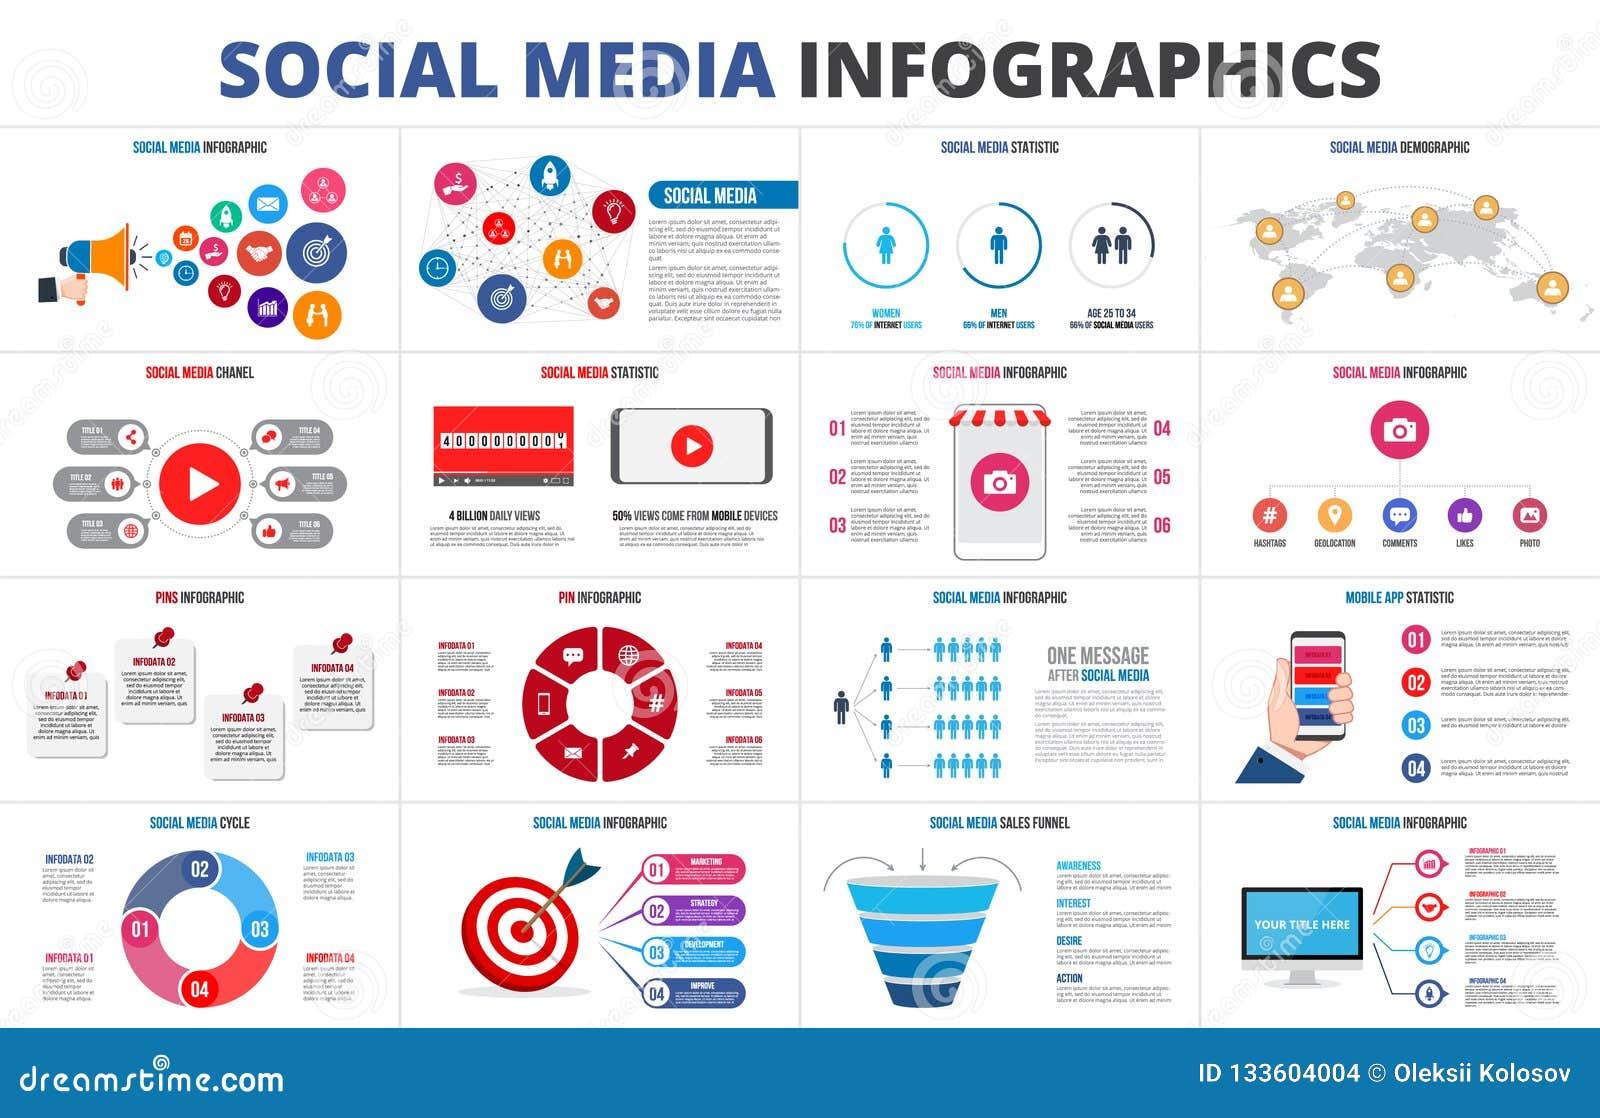 Vector sales funnel, statistic, map, online video chanel and pins. Social media infographic set. Presentation slides